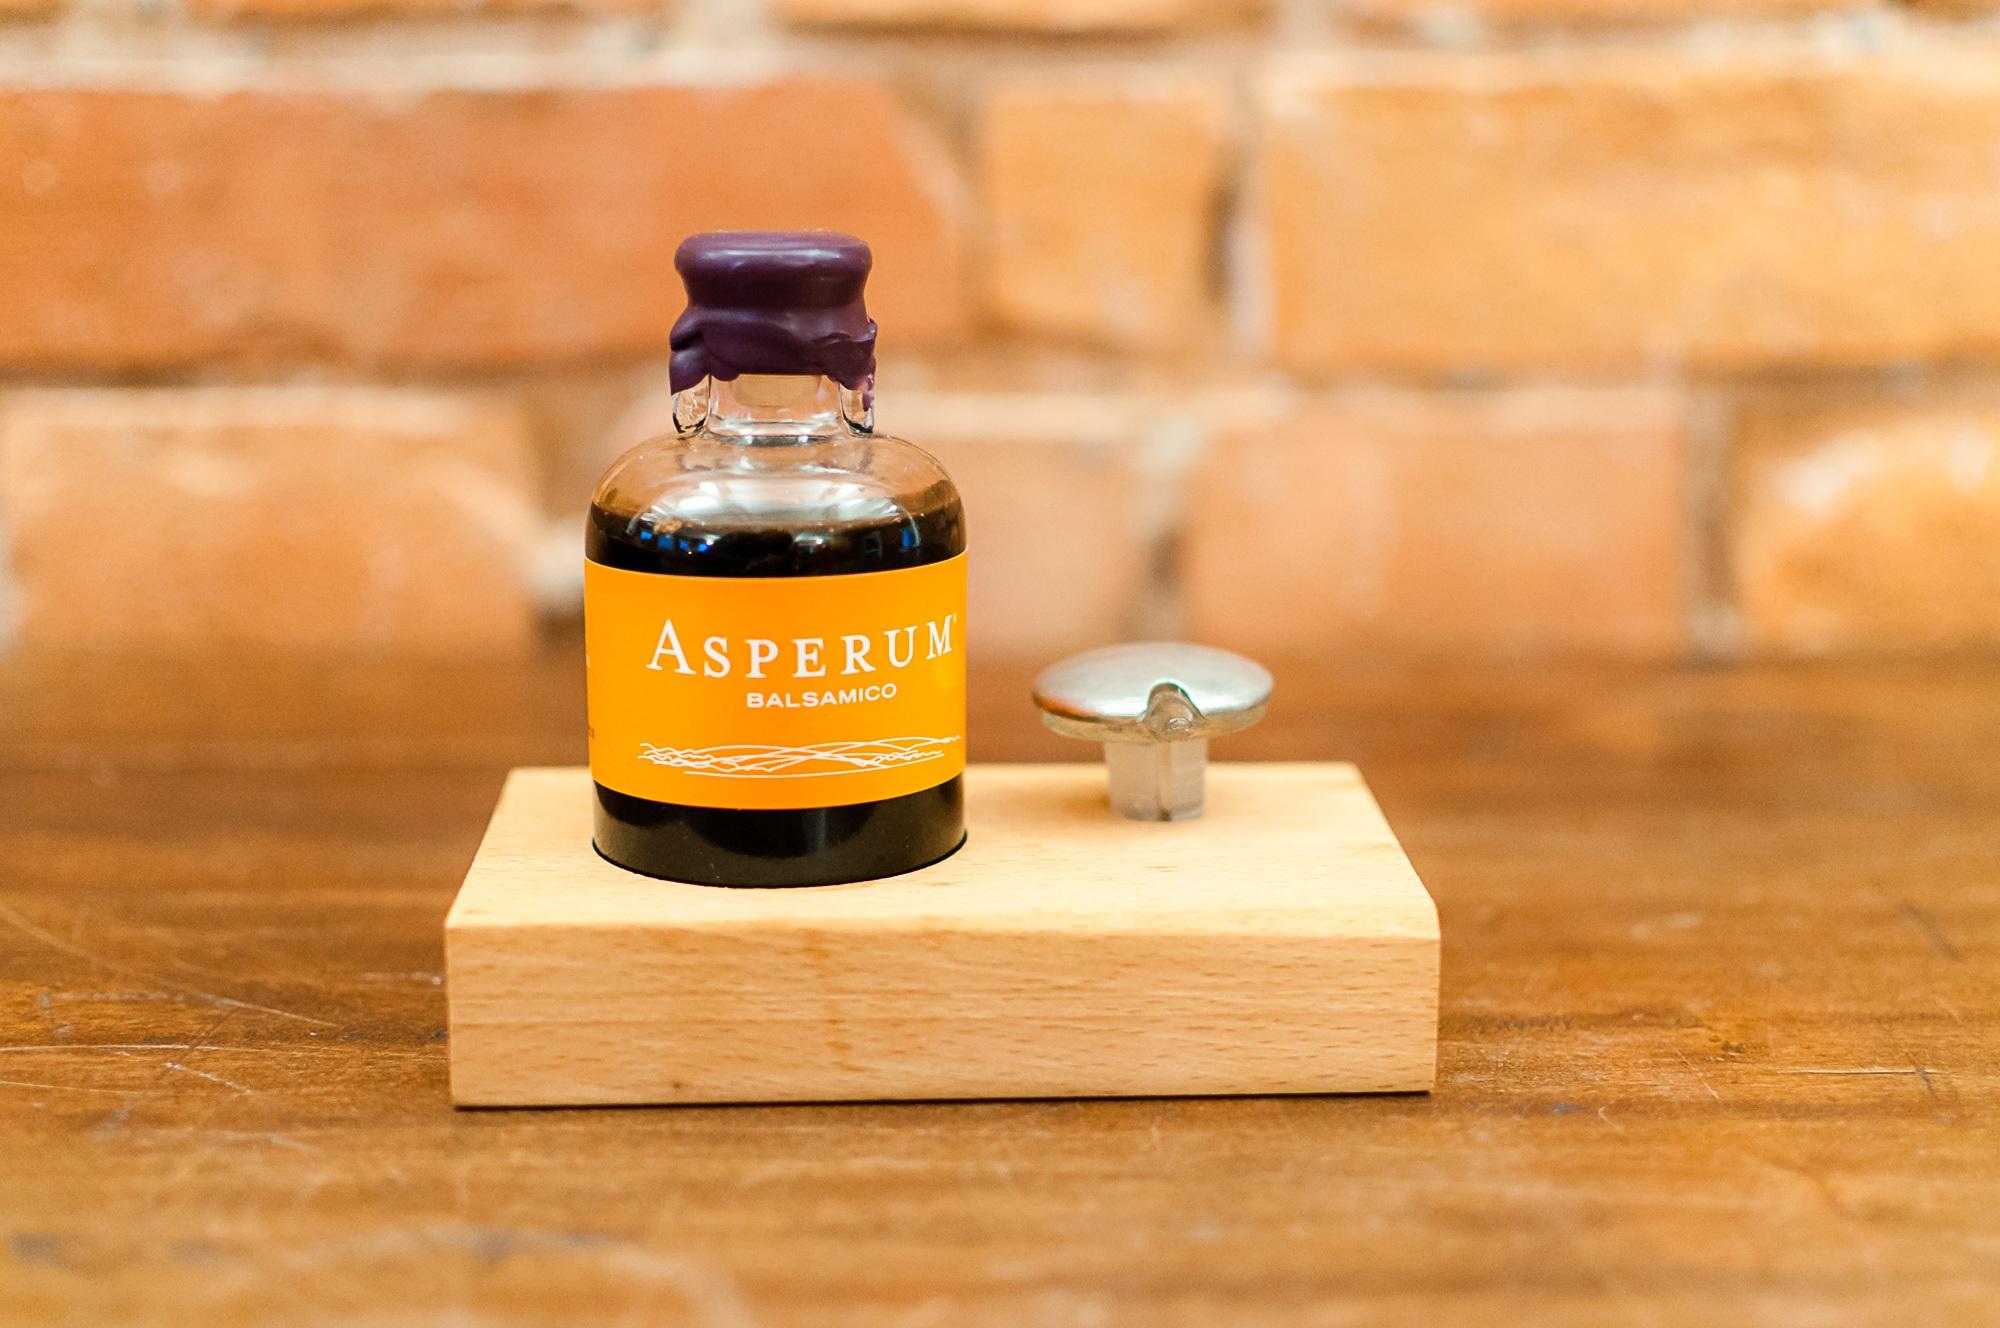 balsamic vinegar called Asperum